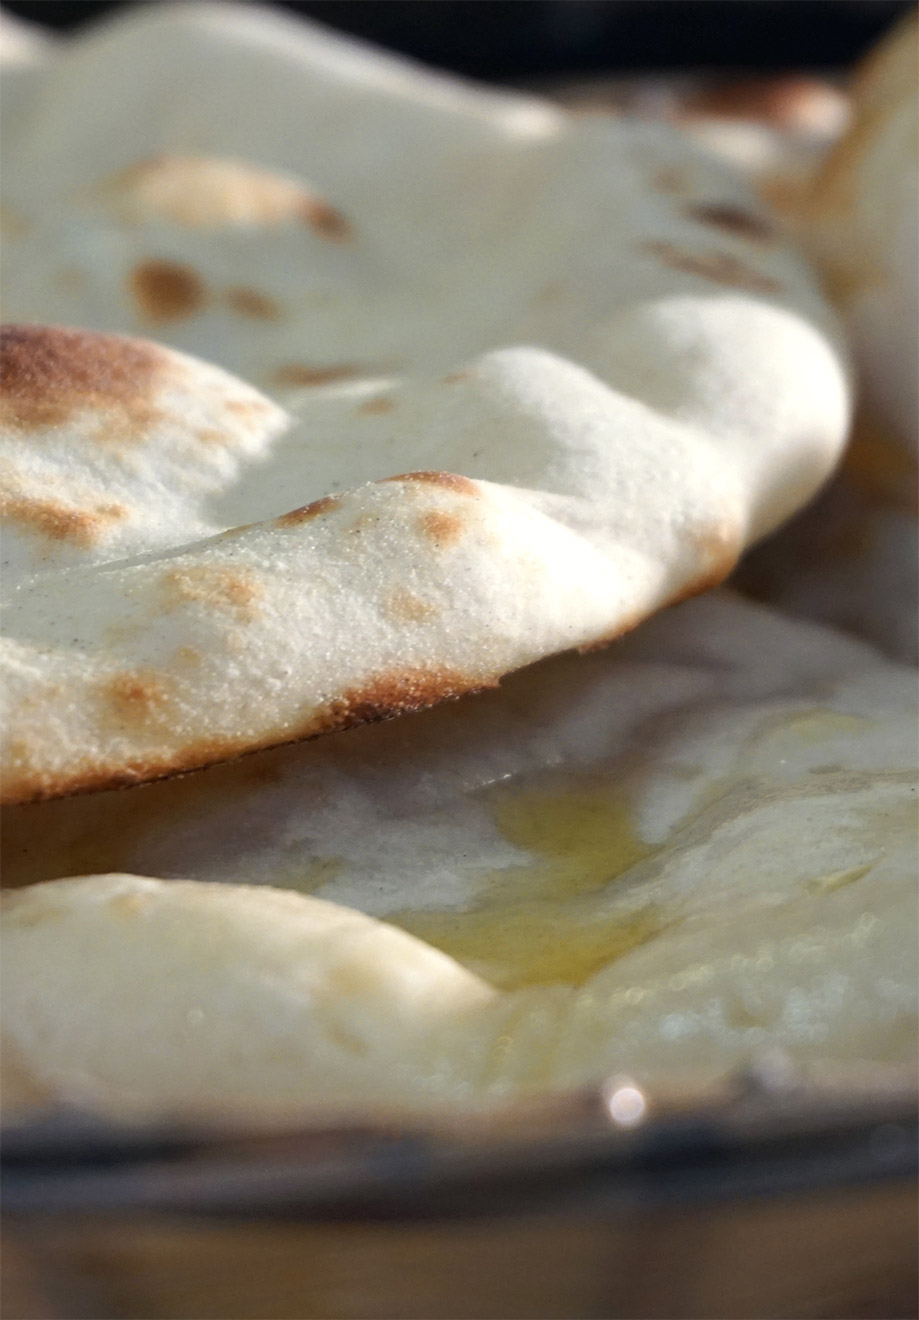 bangladeshisk mat uppsala